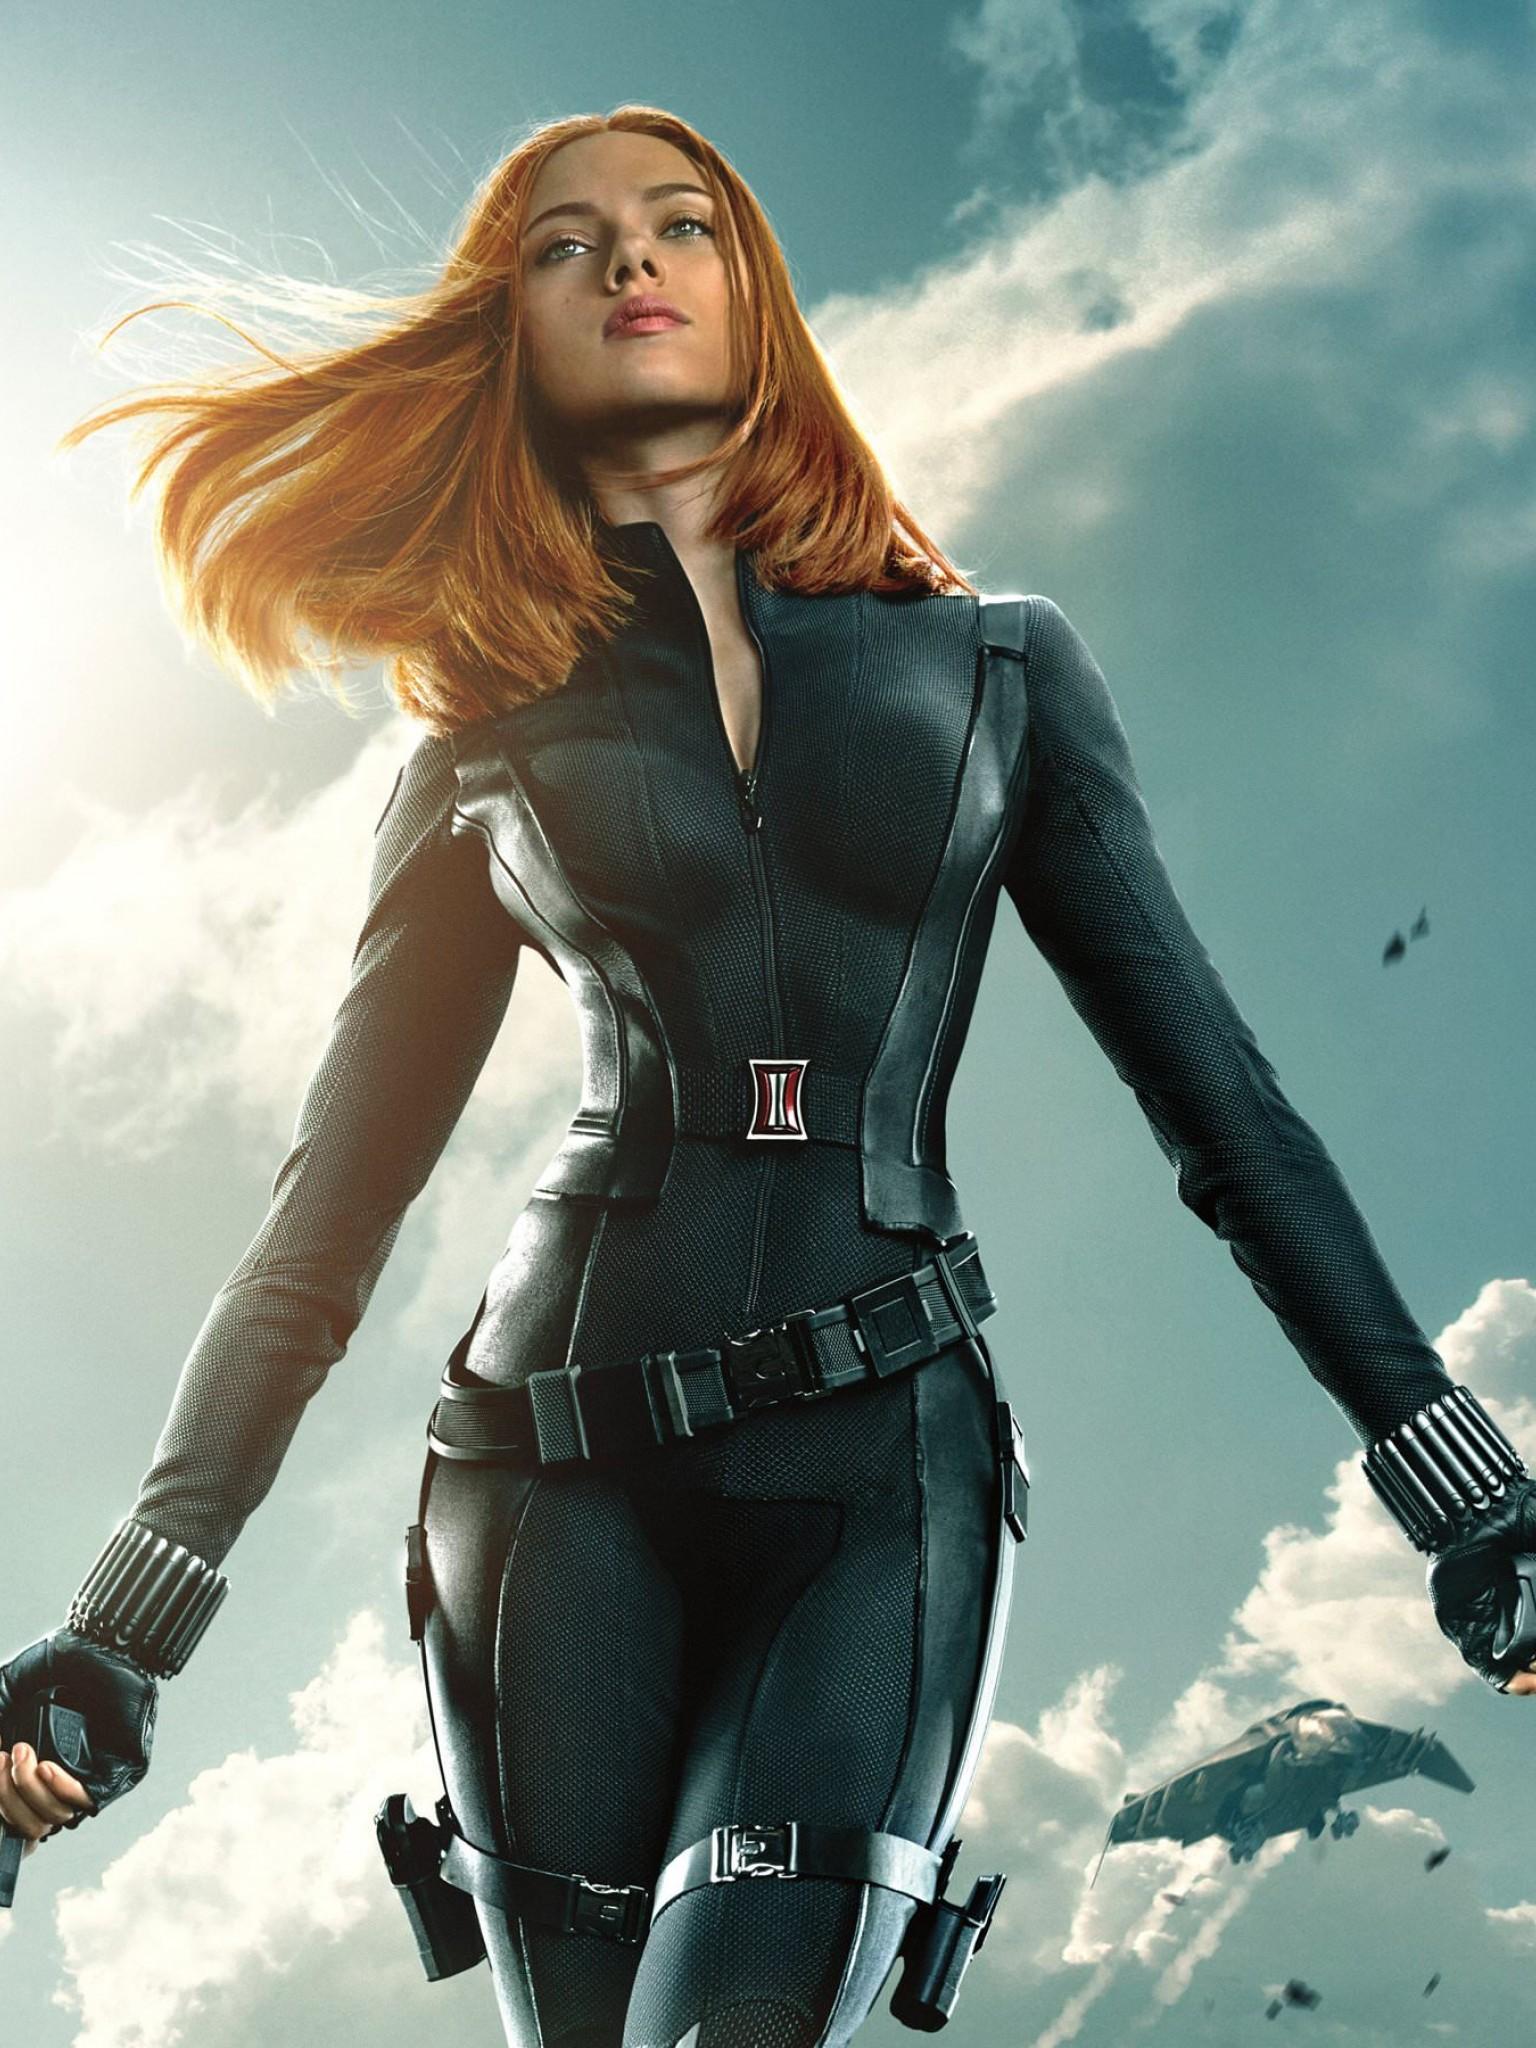 Scarlett Johansson Hd Wallpaper for Desktop and Mobiles Retina 1536x2048